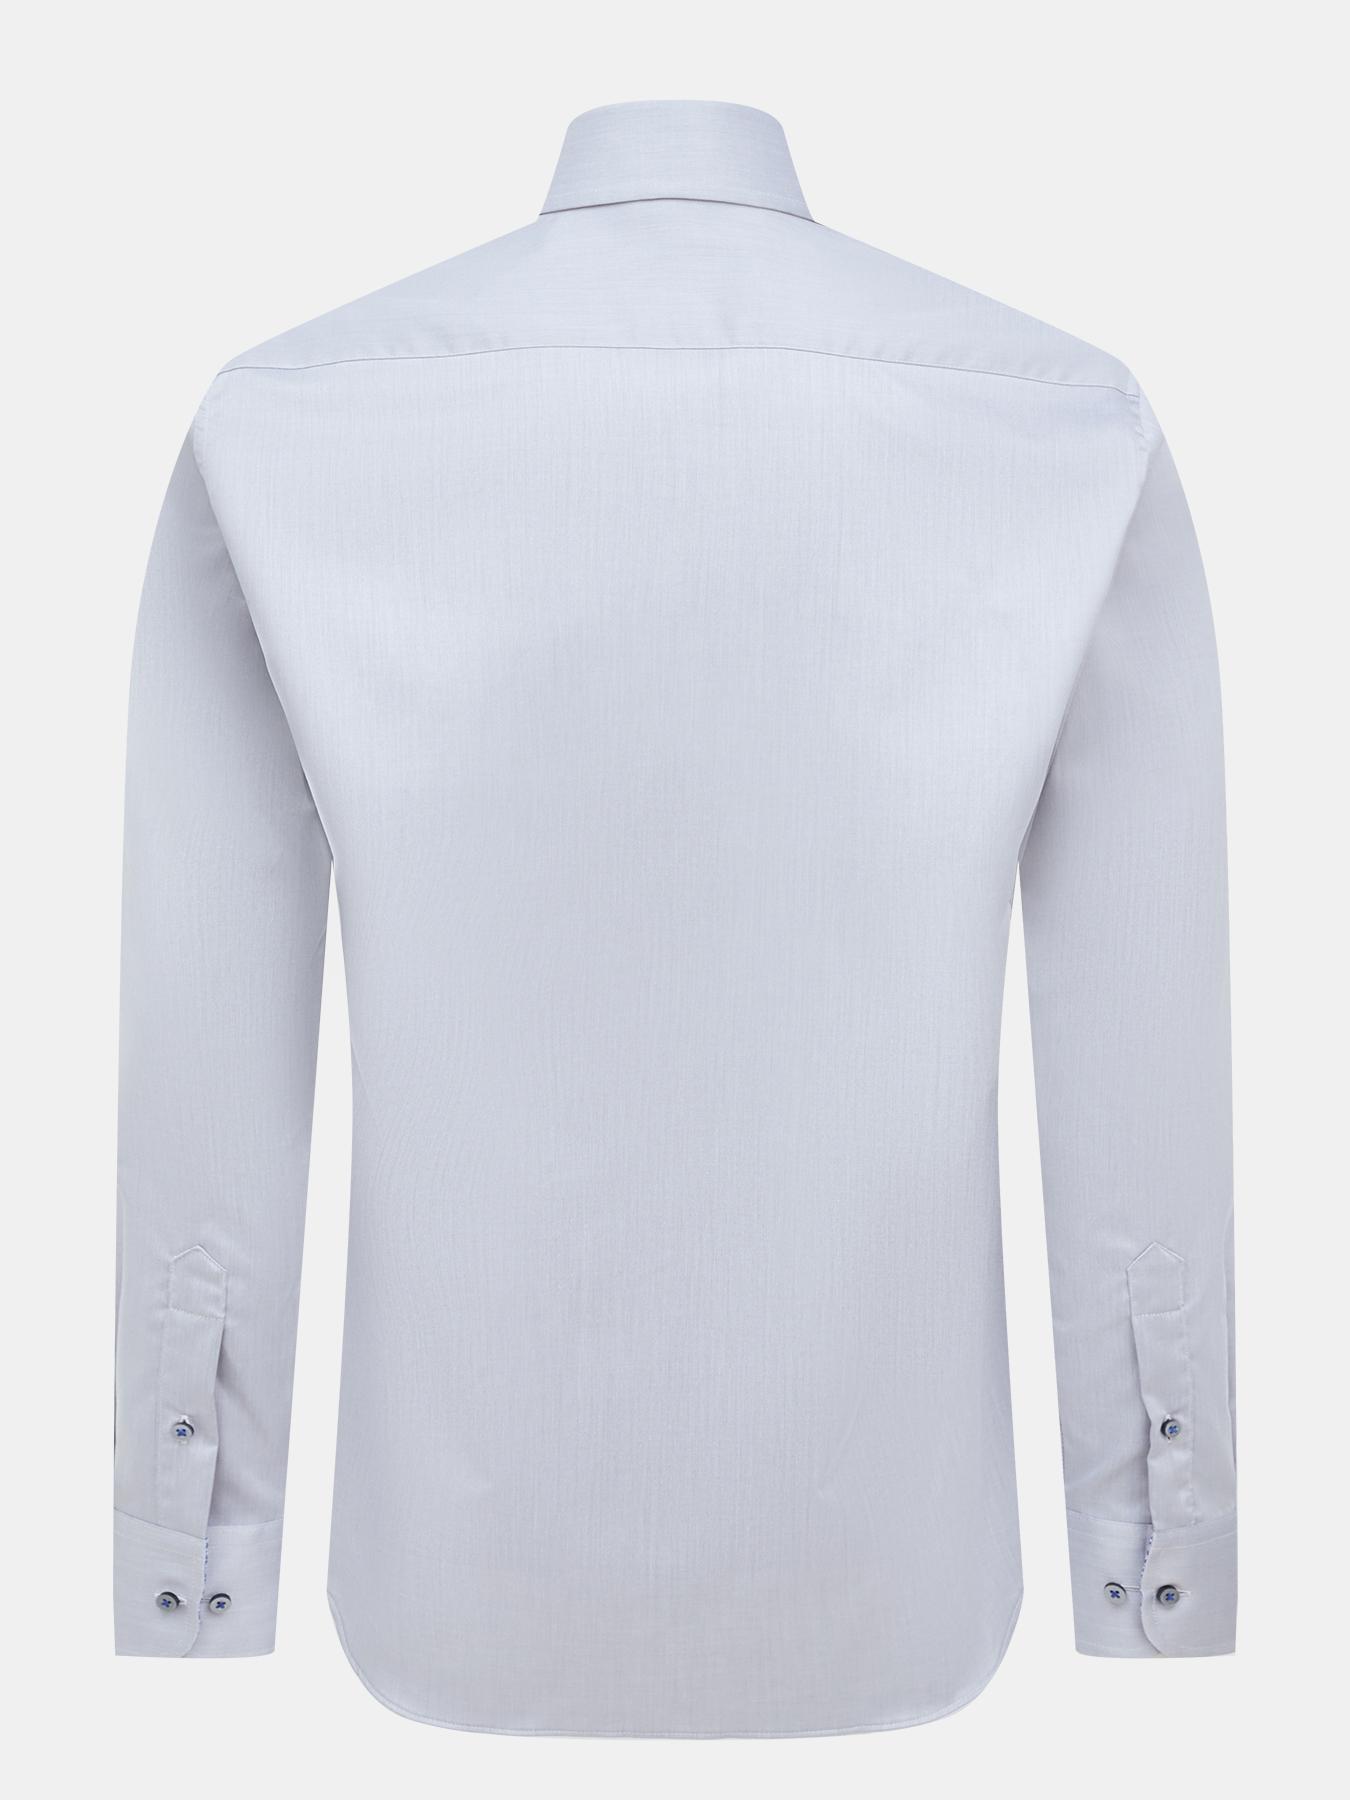 Рубашка Eterna Рубашка рубашка bawer bawer mp002xw0r3l2